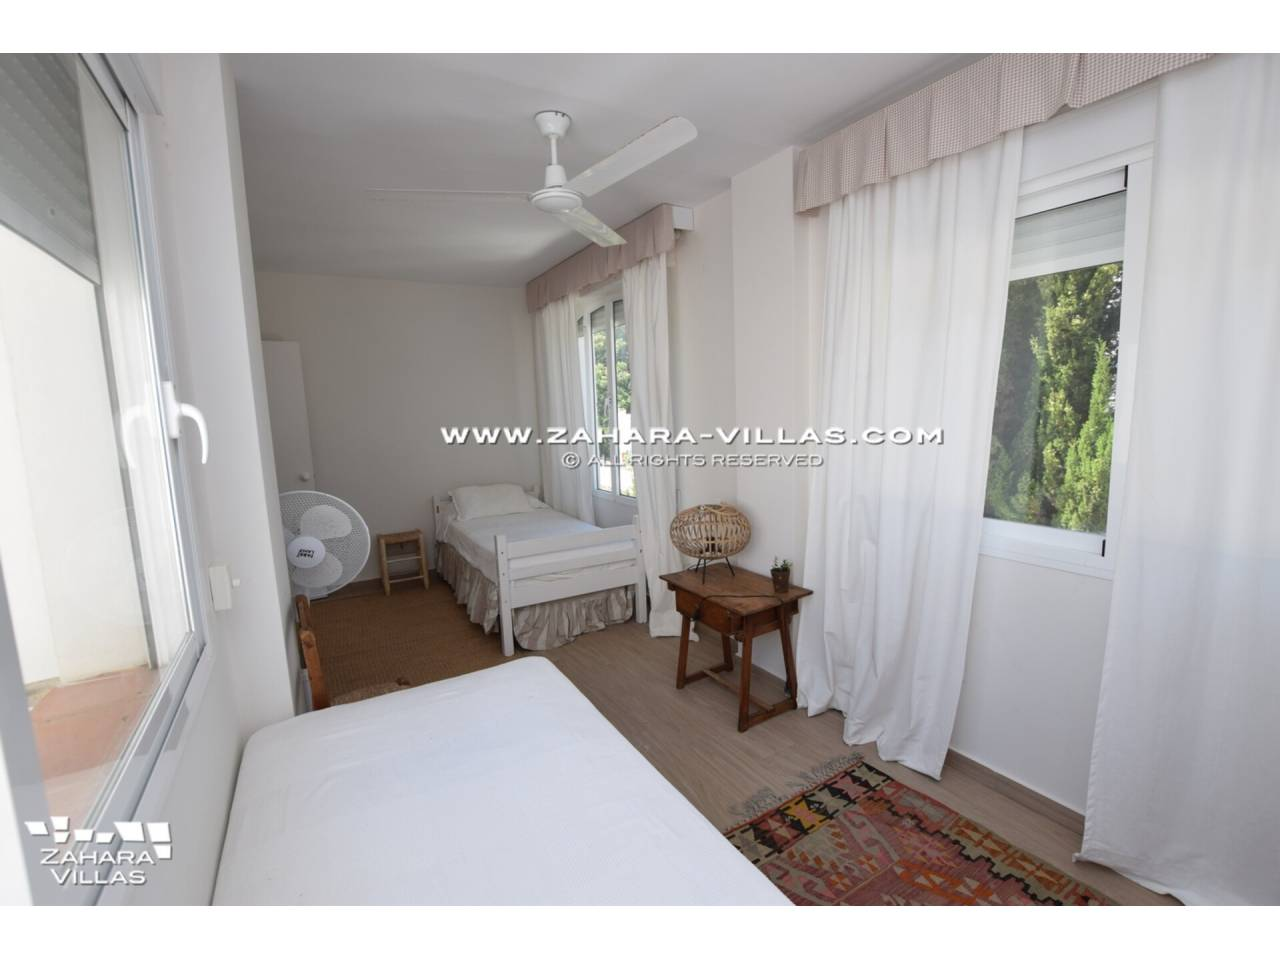 Imagen 29 de House for sale close to the beach, with sea views in Zahara de los Atunes